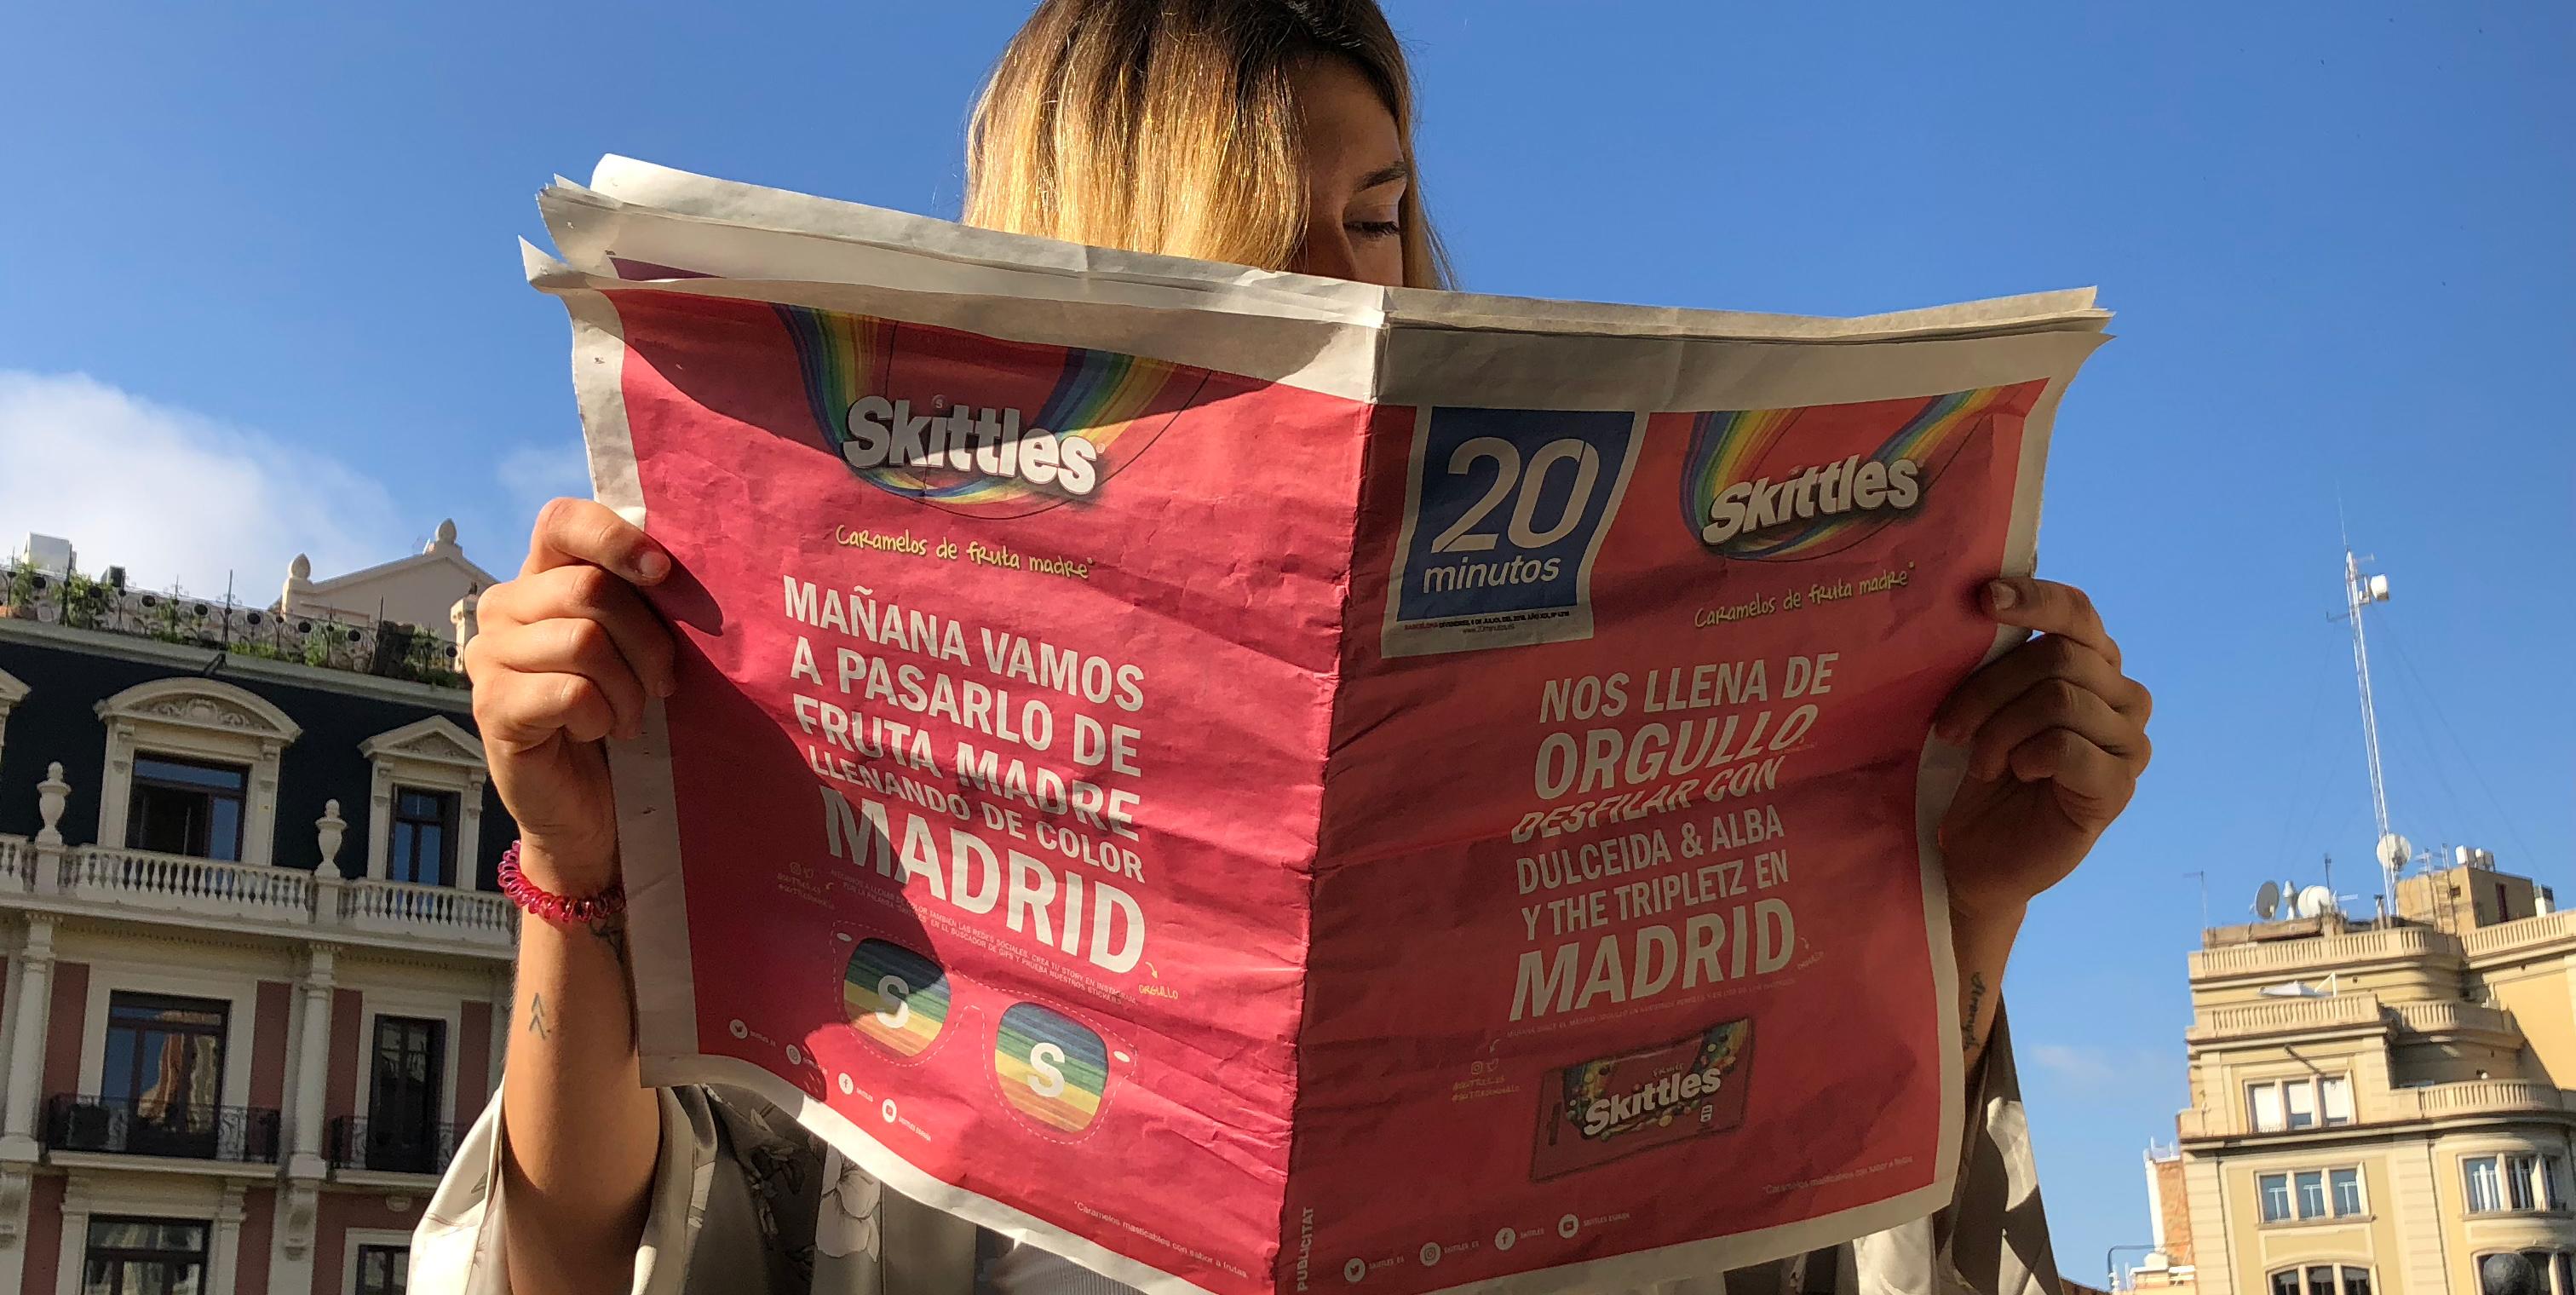 CELEBRAMOS EL MADRID ORGULLO CON SKITTLES Y DULCEIDA